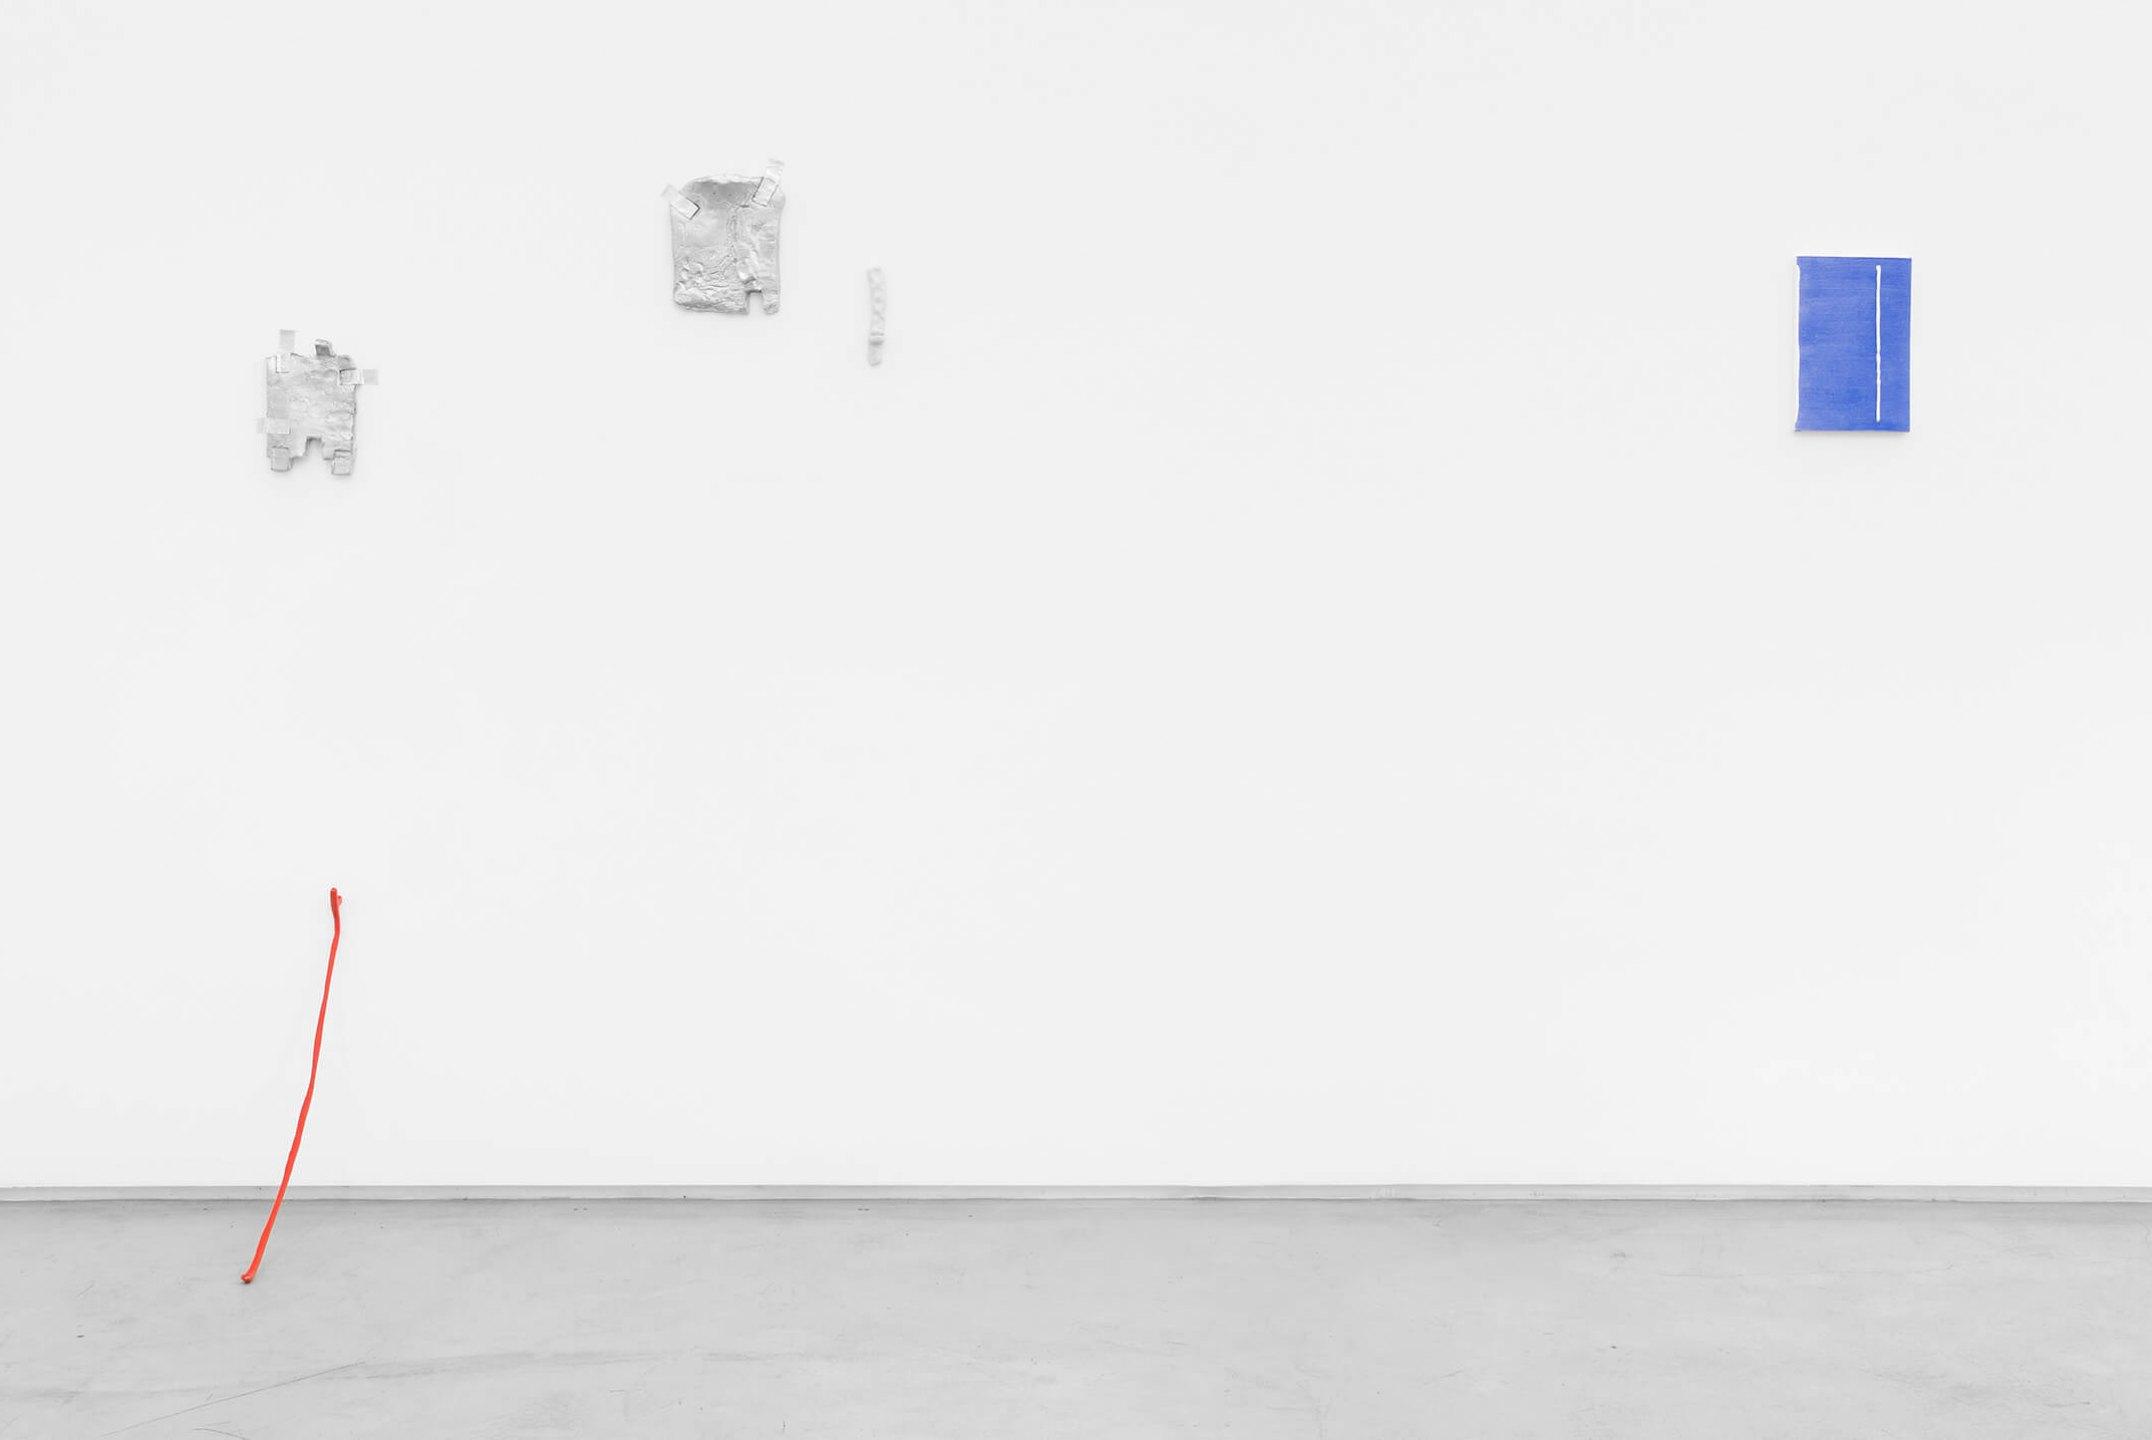 Paulo Monteiro,&nbsp;<em>The inside of distance,</em>&nbsp;Mendes Wood DM, São Paulo, 2015 - Mendes Wood DM